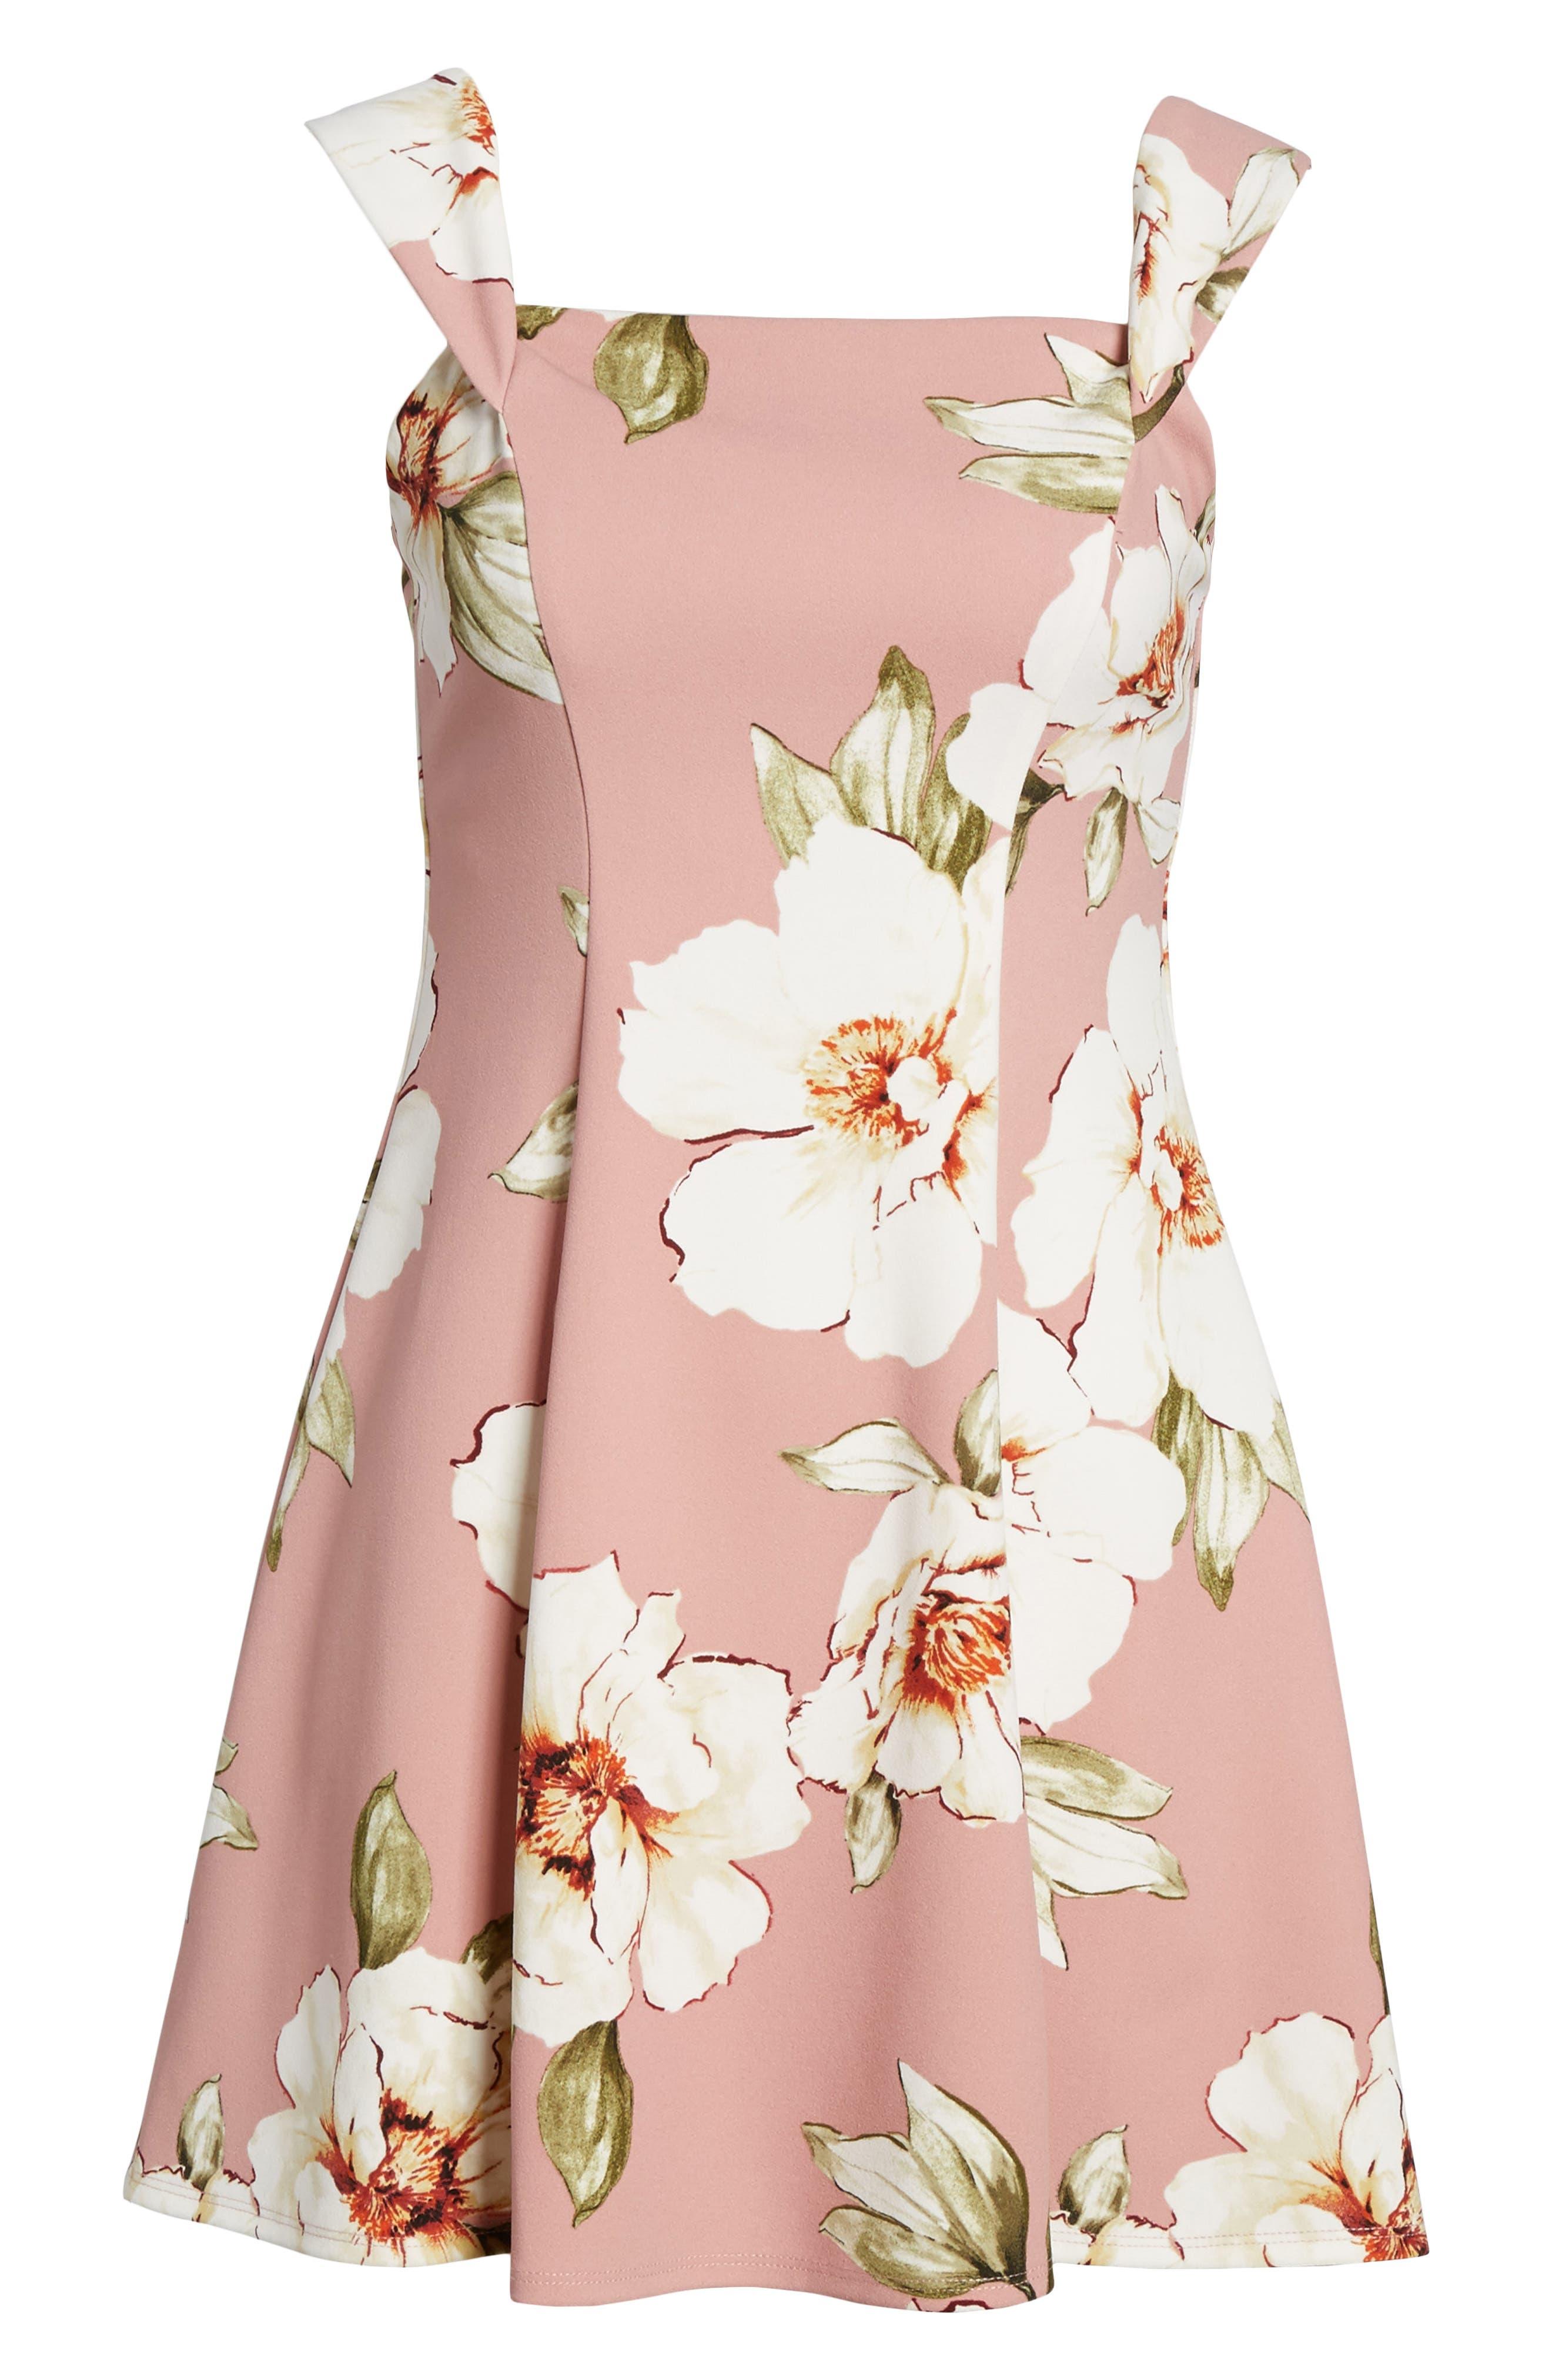 Floral Print Off the Shoulder A-Line Dress,                             Alternate thumbnail 6, color,